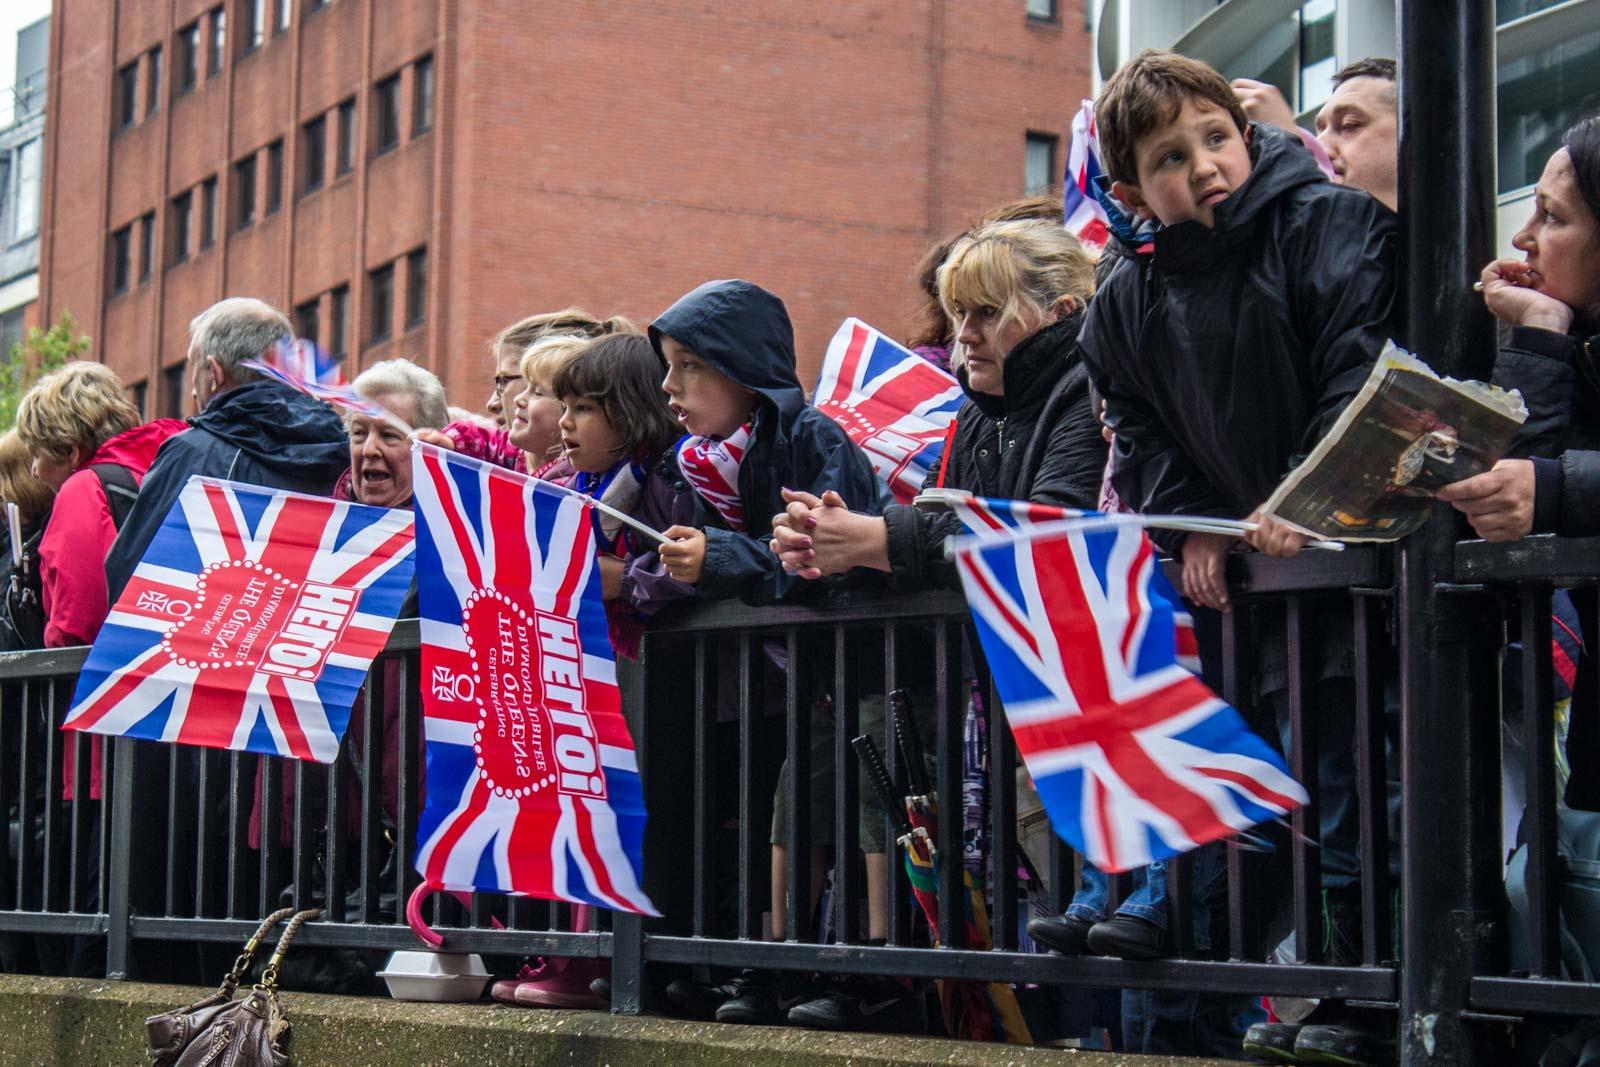 diamond jubilee flotilla, london, thames, queen's jubilee, river parade